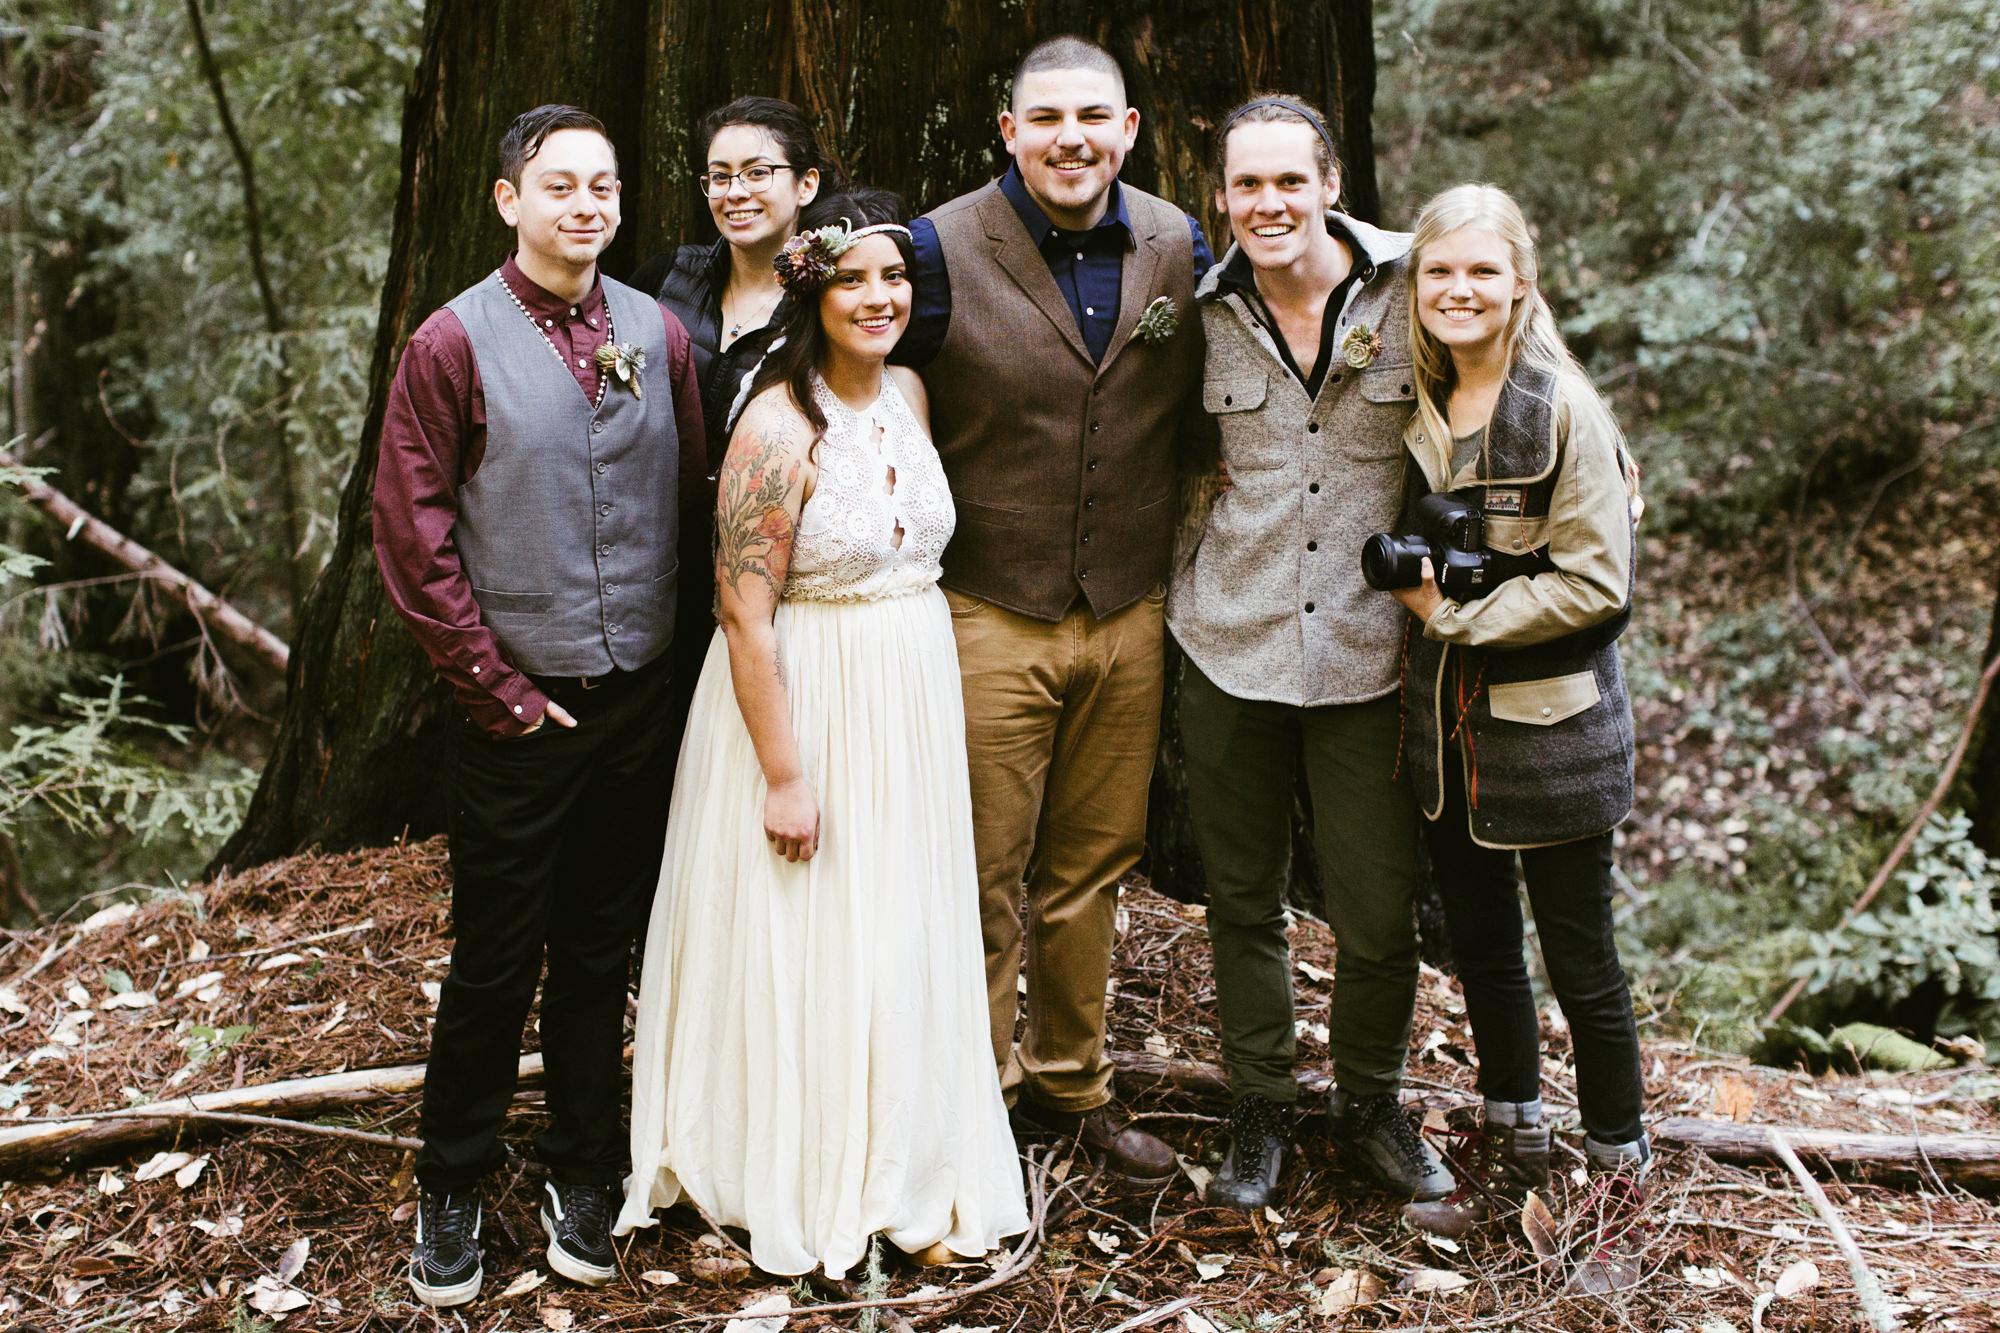 hiking elopement in the california redwoods forest | destination adventure wedding photographers | the hearnes adventure photography | www.thehearnes.com